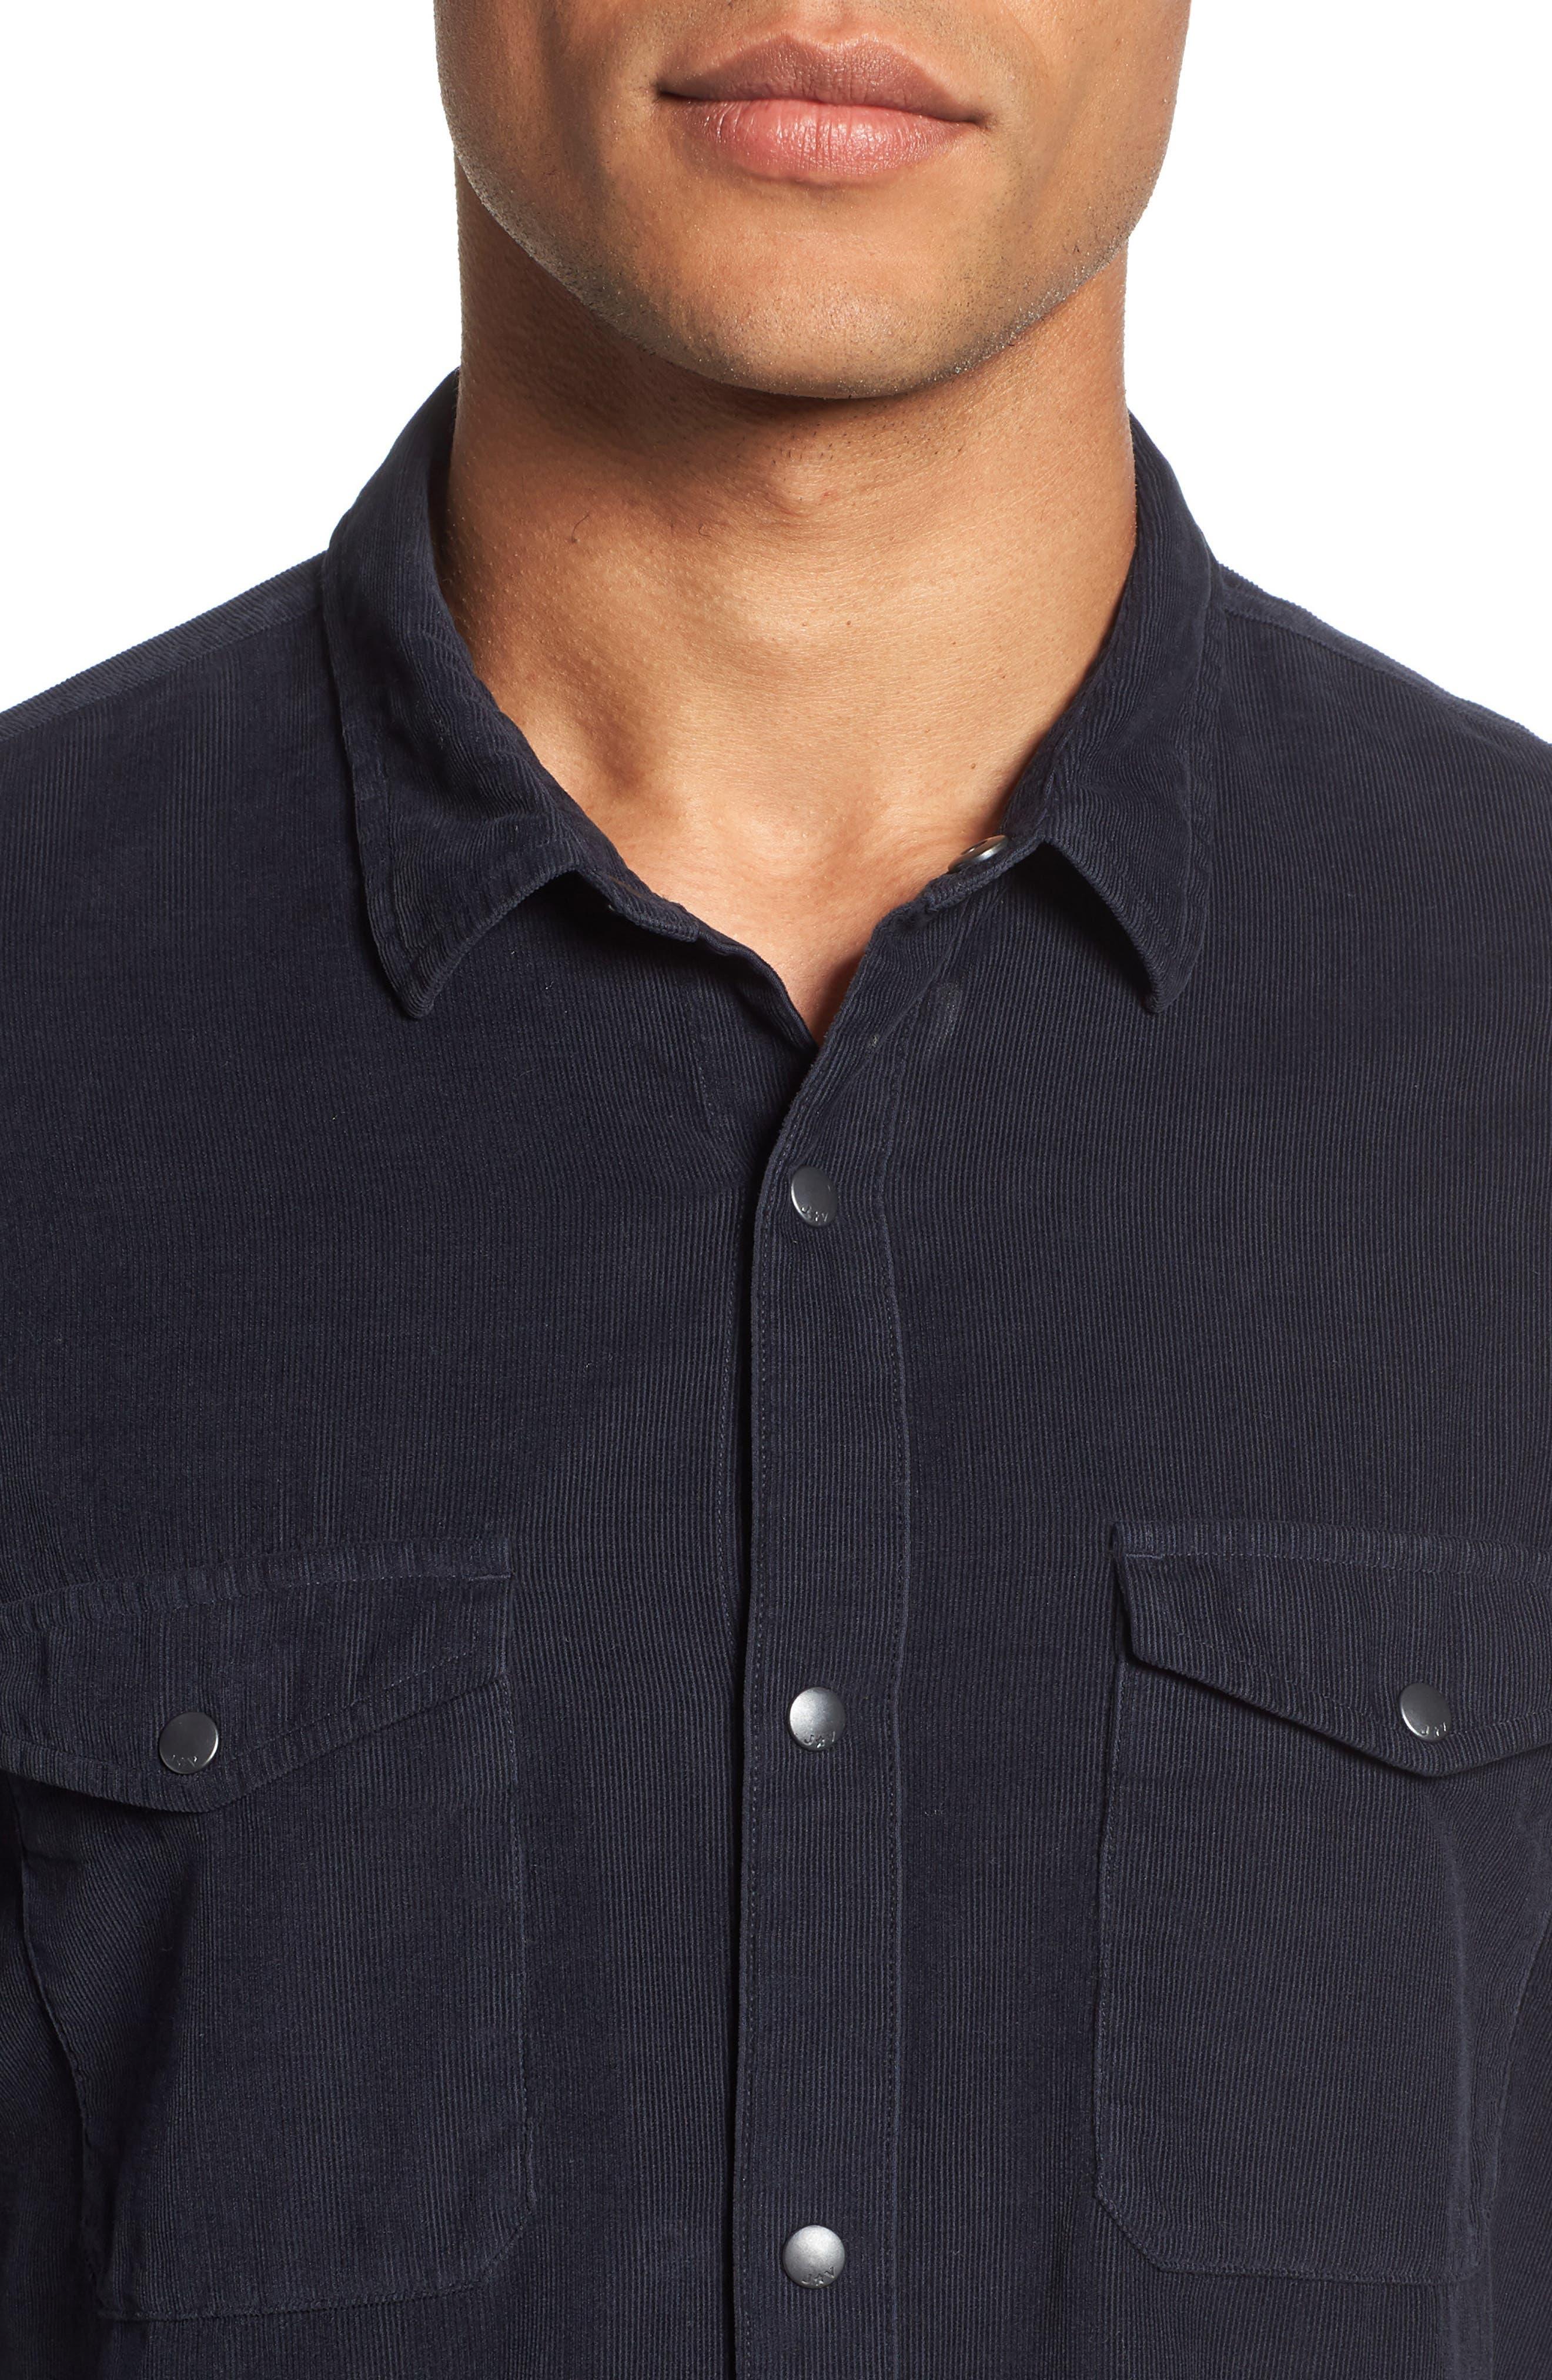 Corduroy Shirt,                             Alternate thumbnail 2, color,                             MIDNIGHT